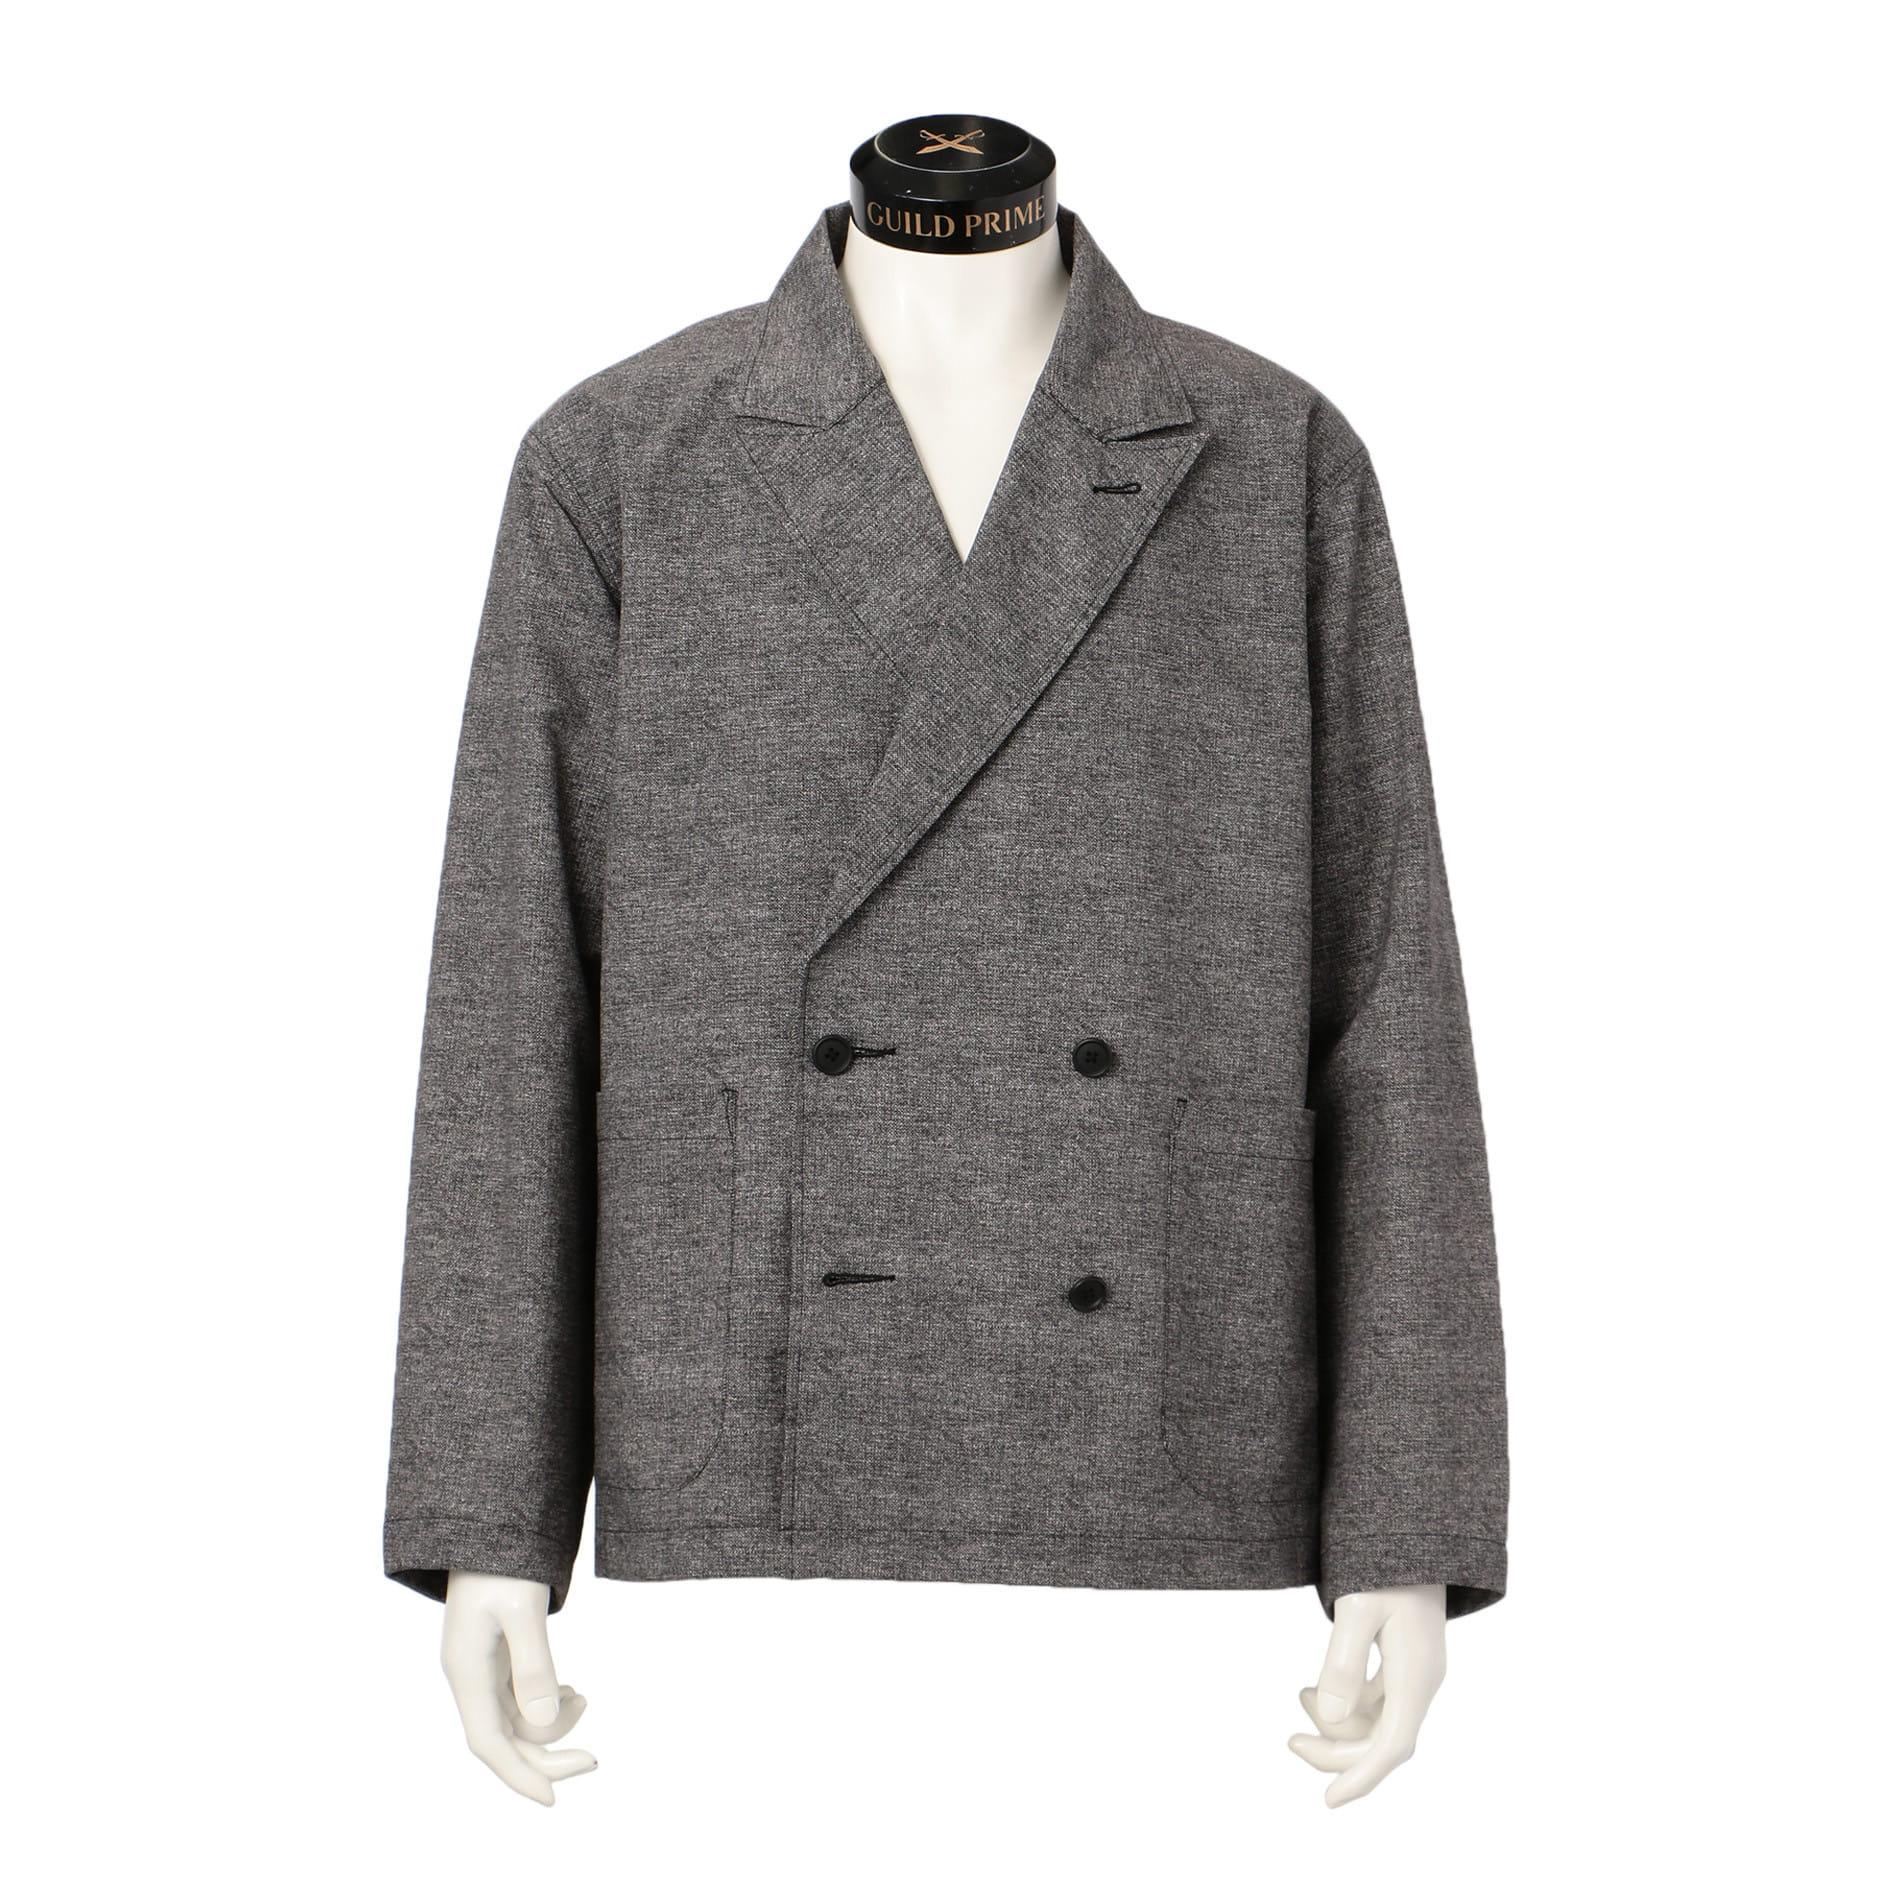 【lideal】MEN シャツジャケット 95291011